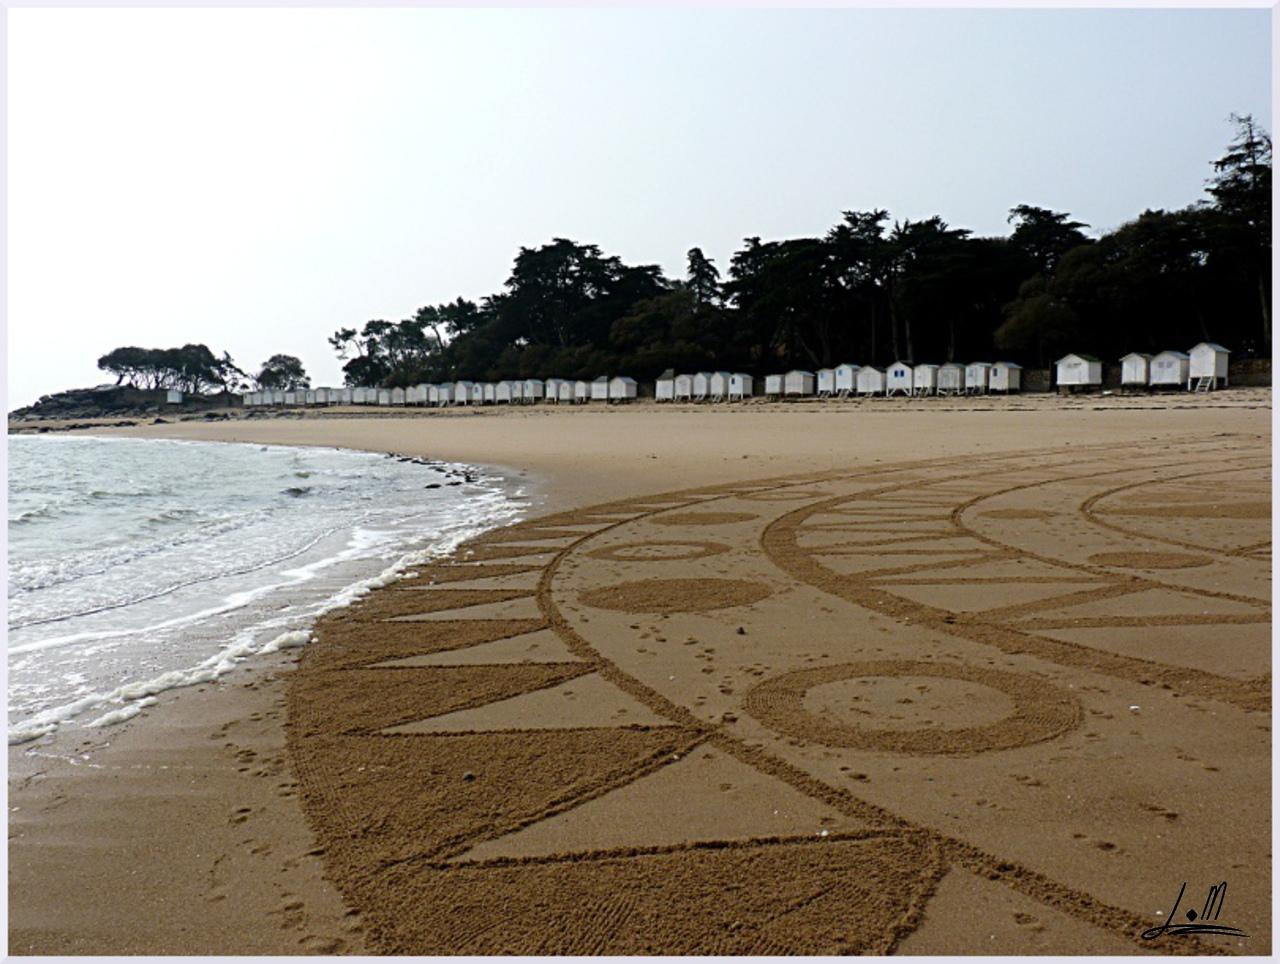 Fresque Beach art Plage des dames, Michel Jobard